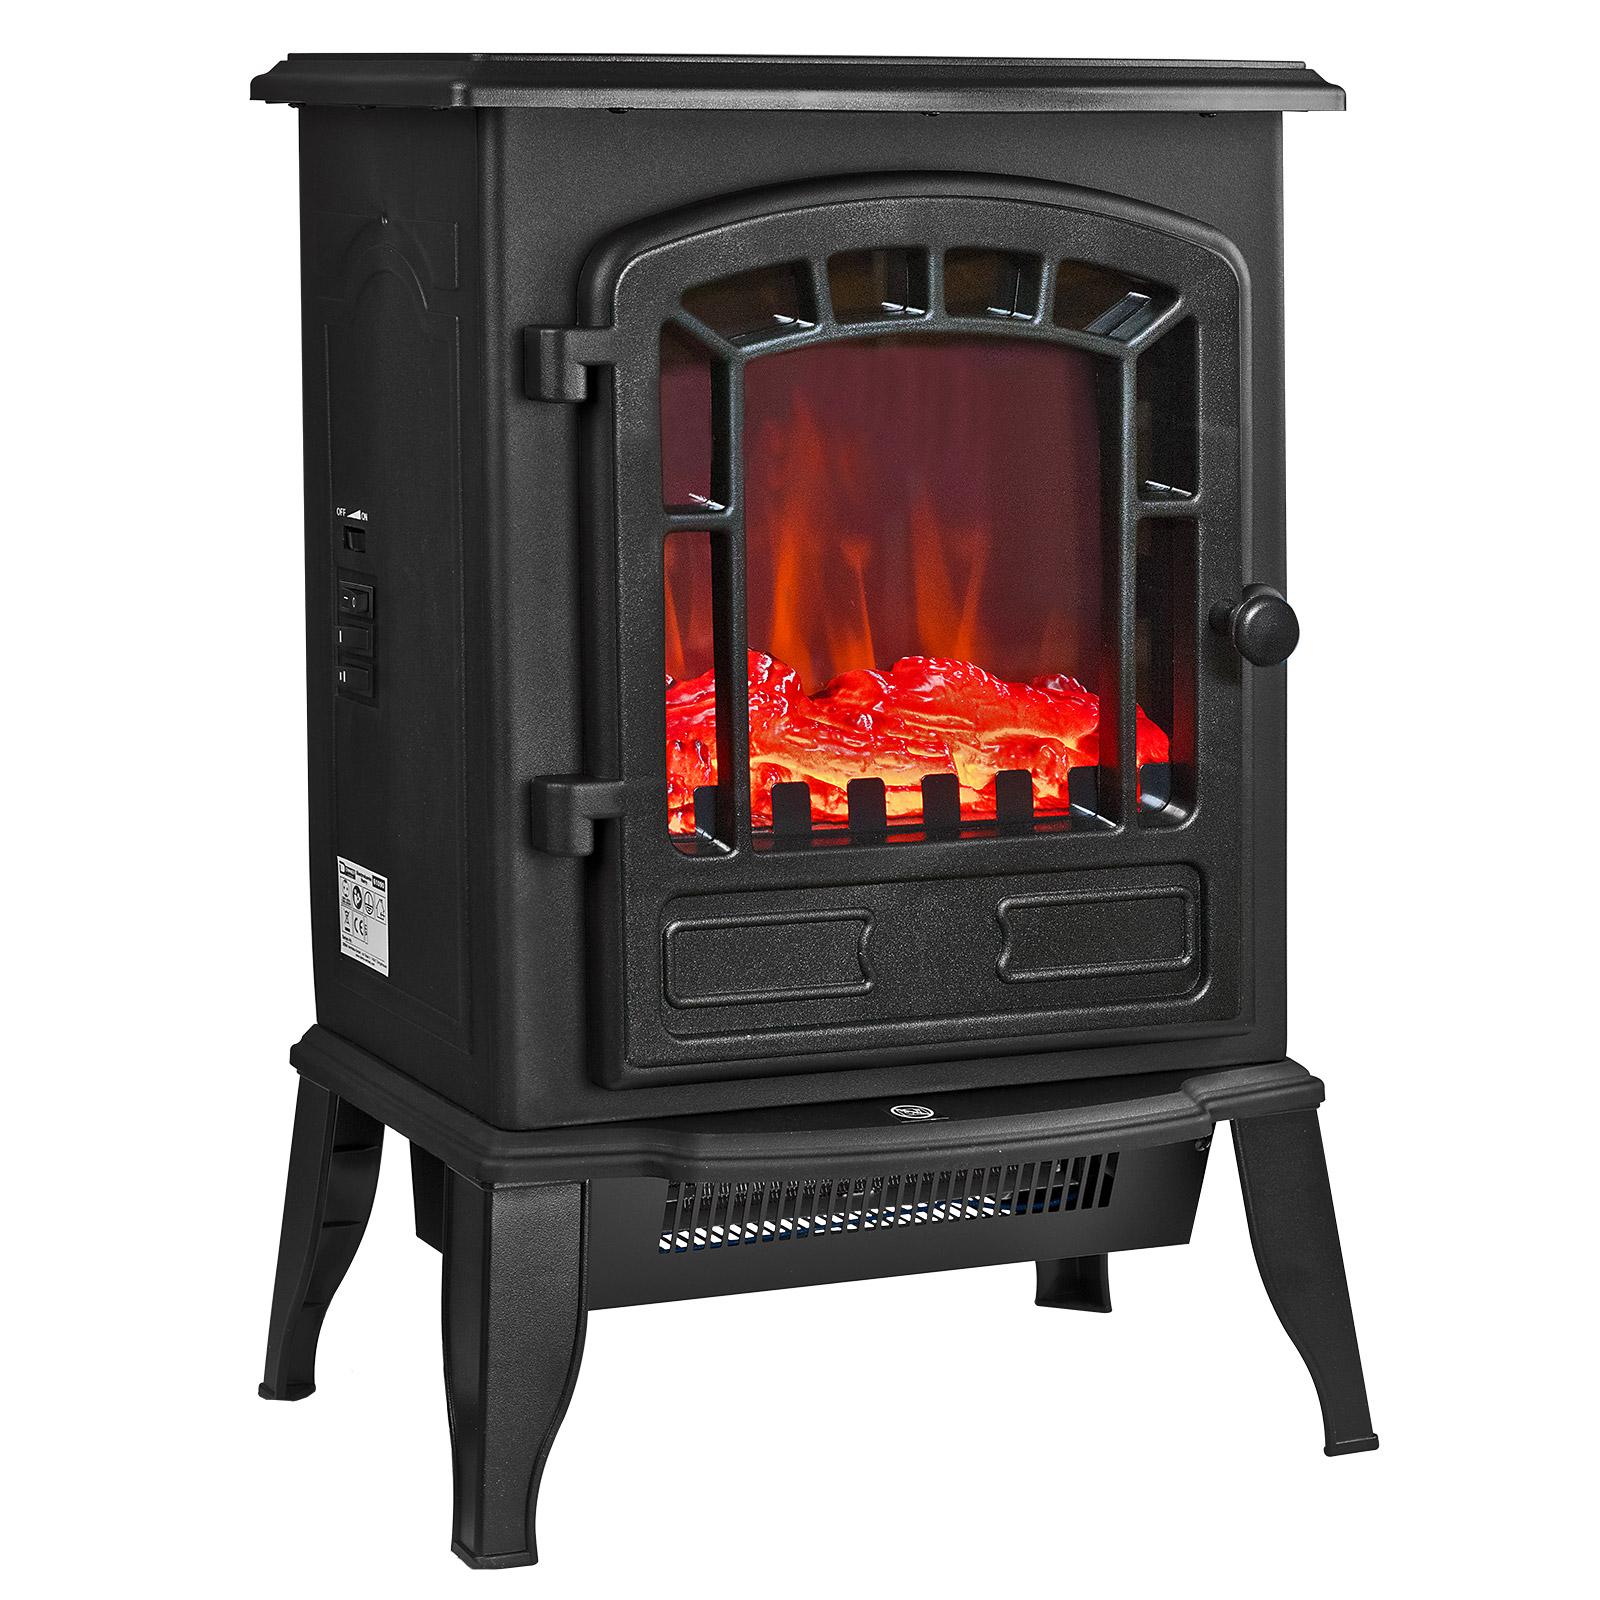 dema Elektrokamin Kamin Kaminofen Ofen Feuer elektrisch Heizung Heizlüfter 2000W 61090